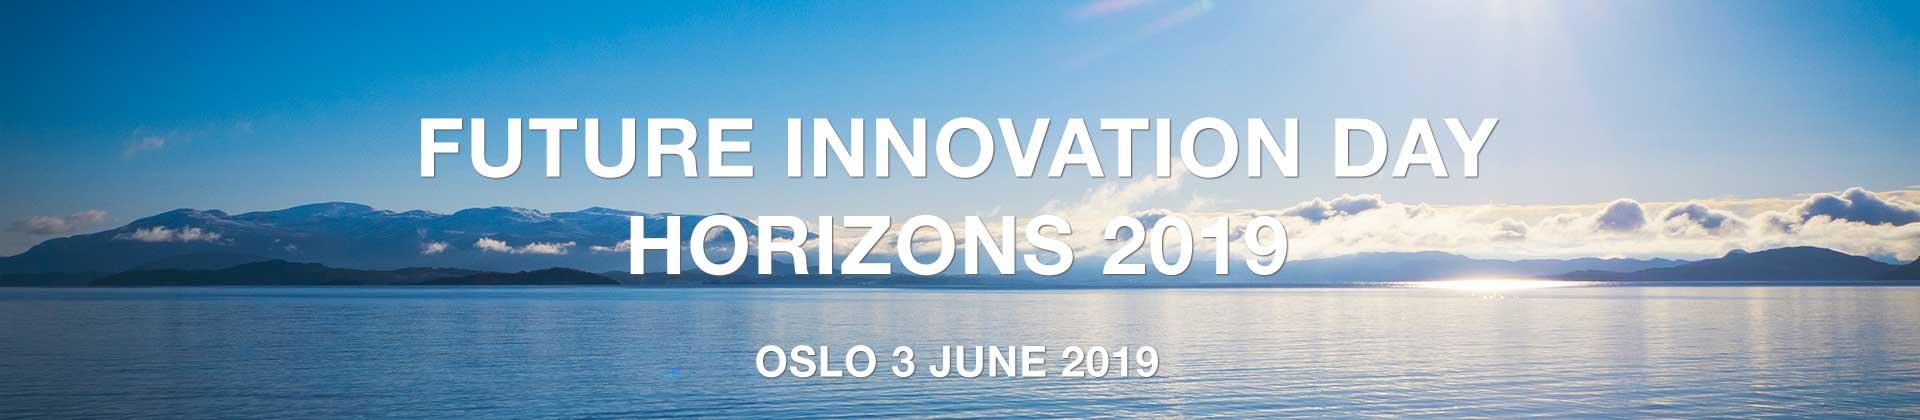 Future Innovation Day 2019 - Oslo